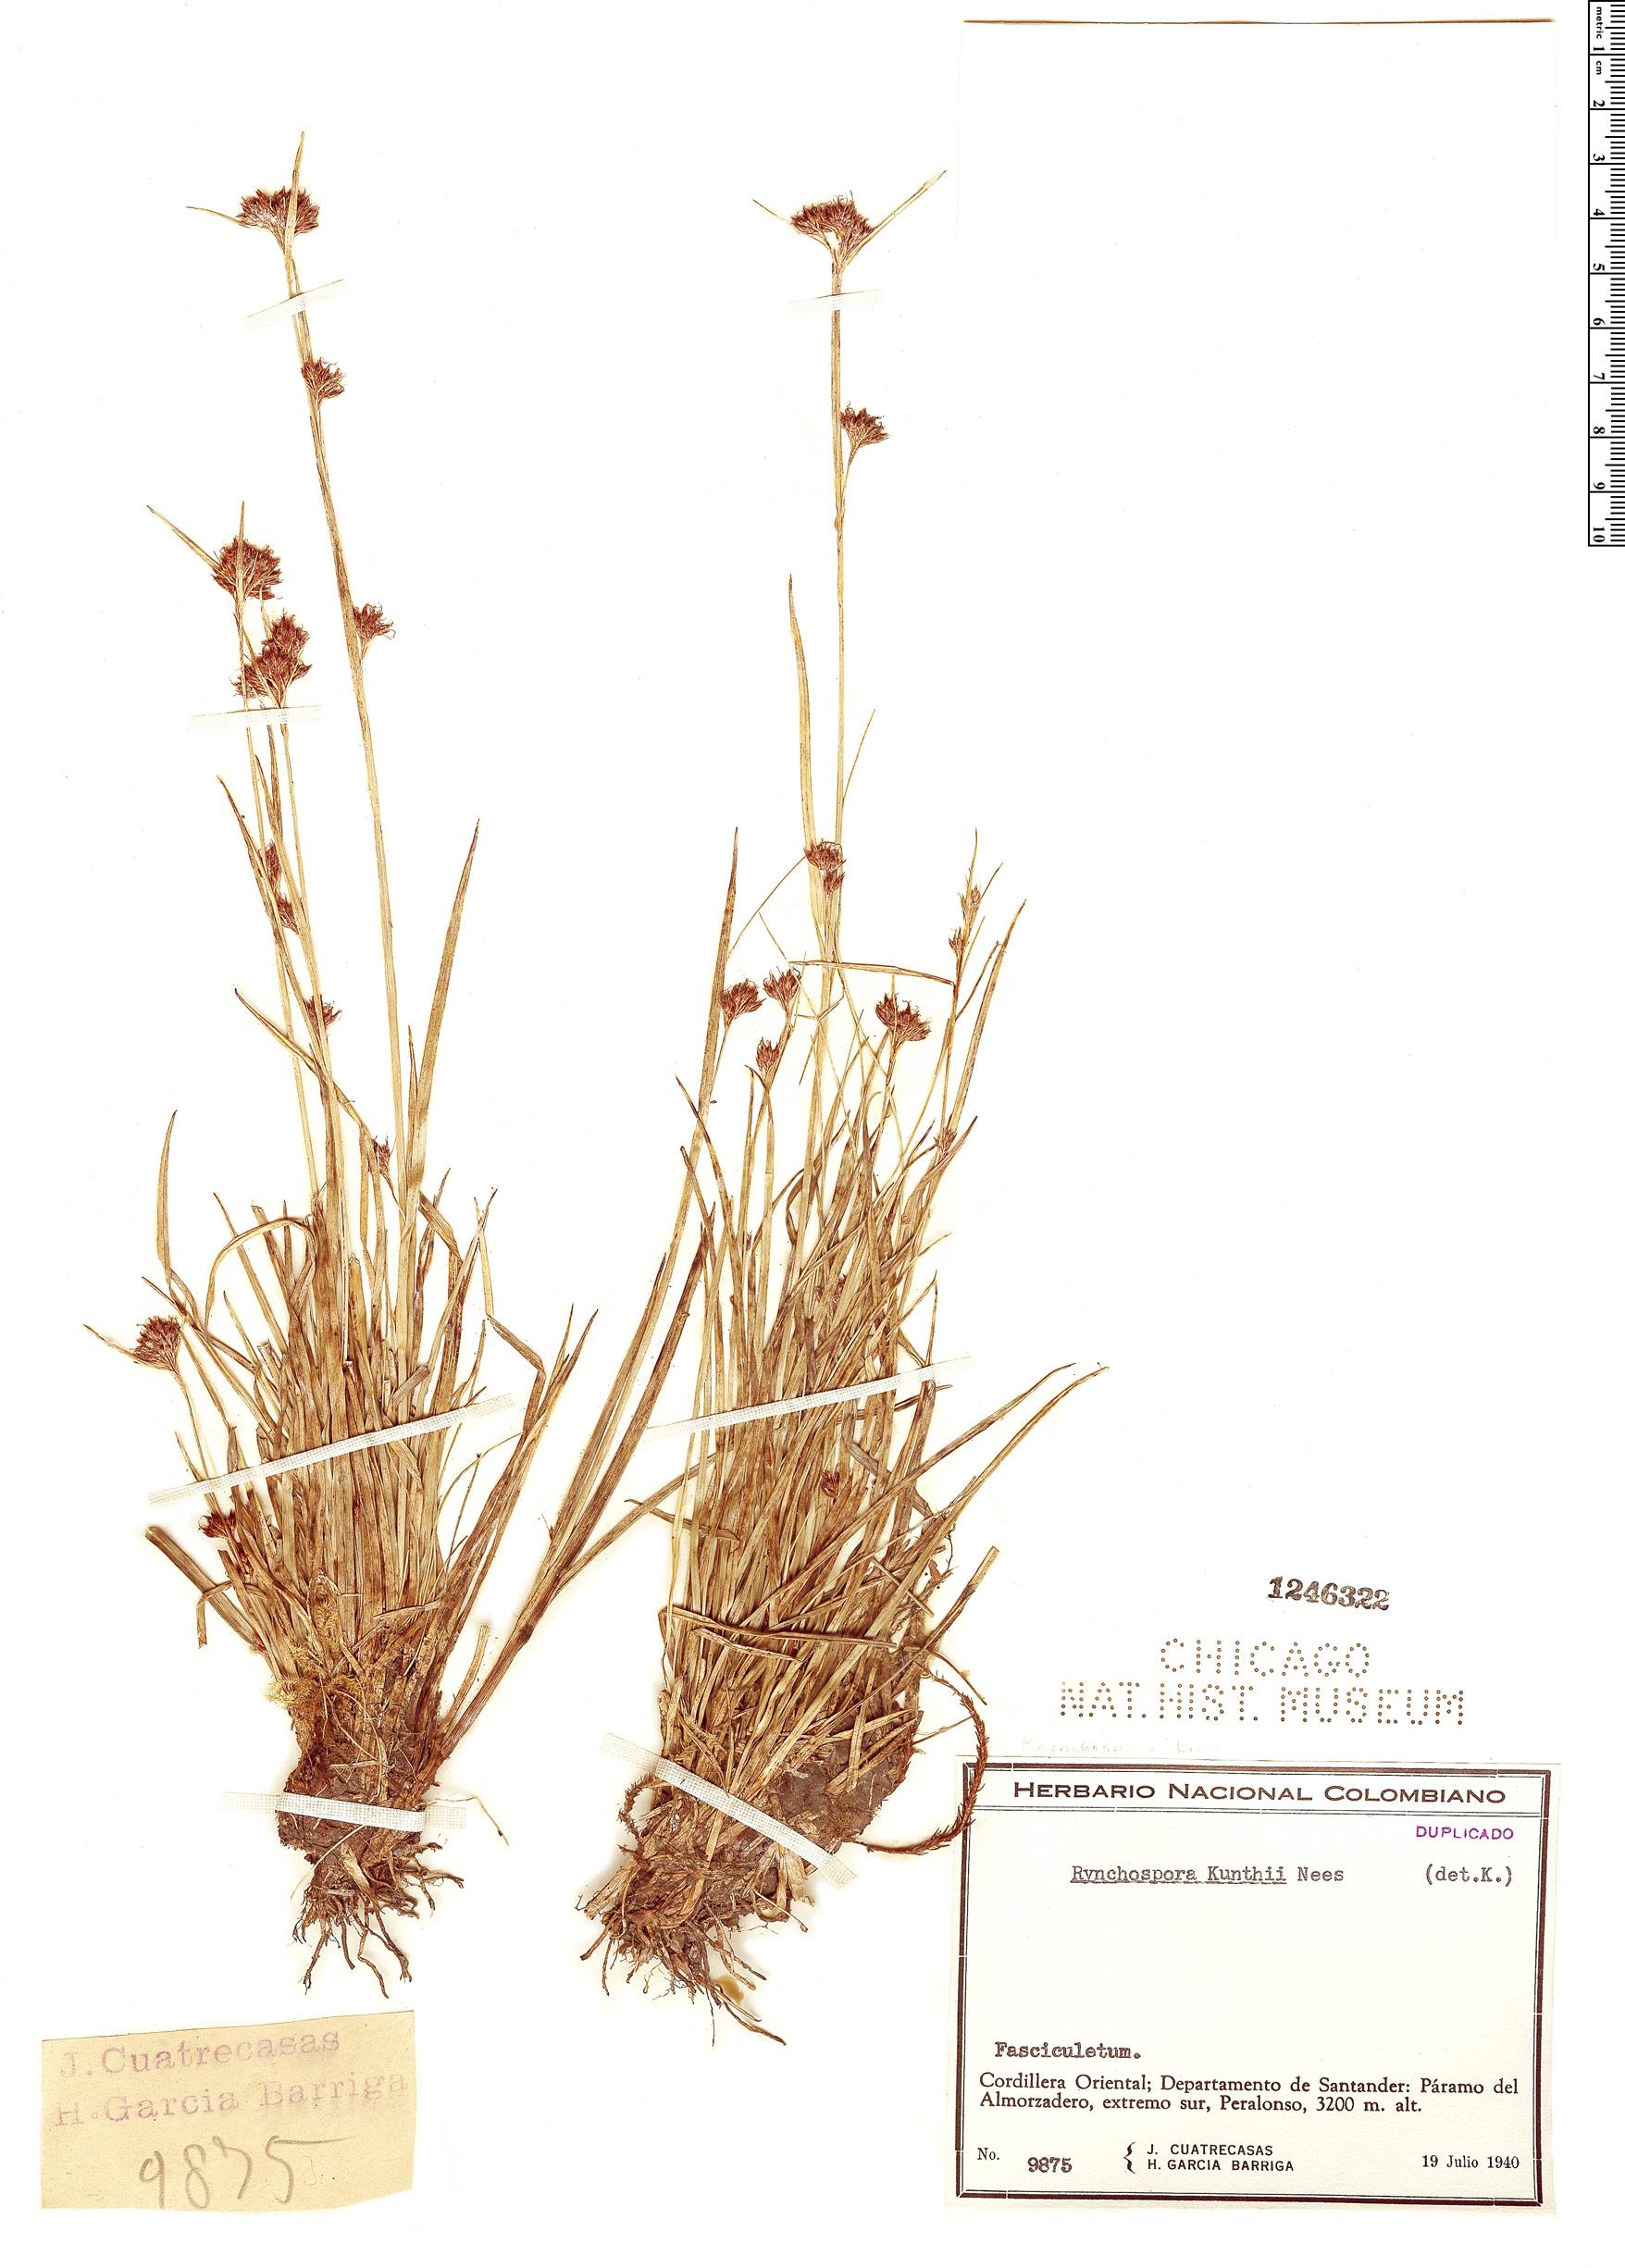 Specimen: Rhynchospora kunthii